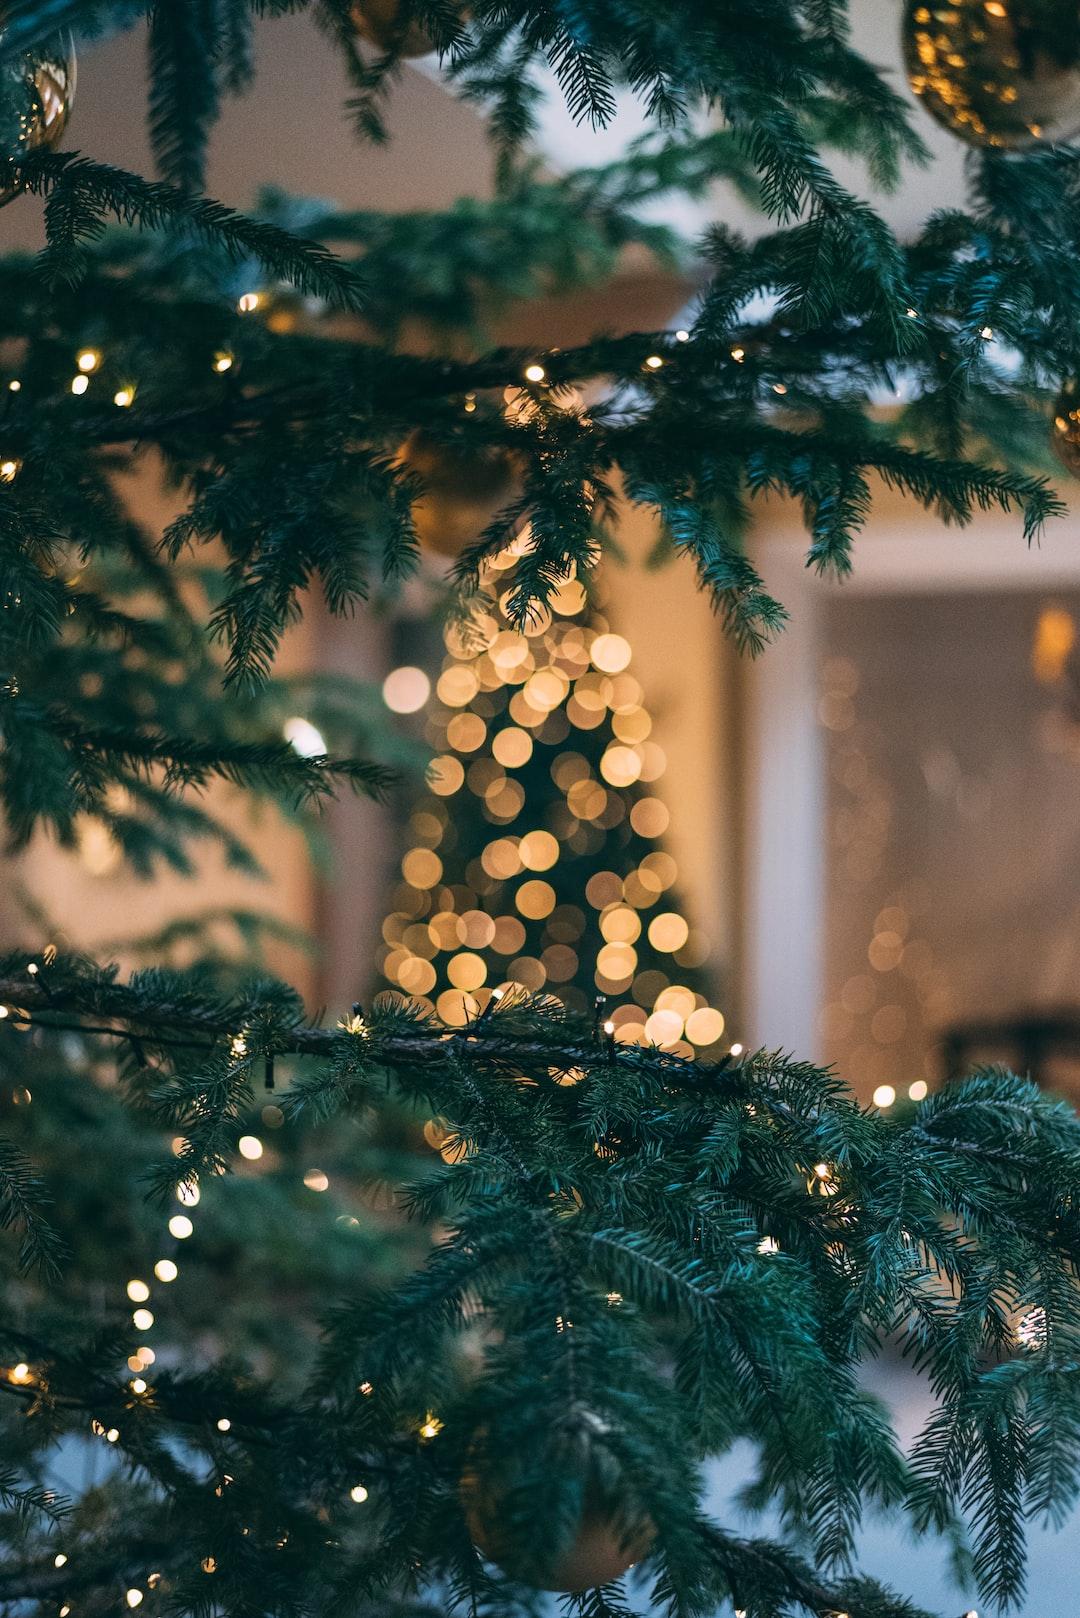 praying mantis eggs on christmas tree